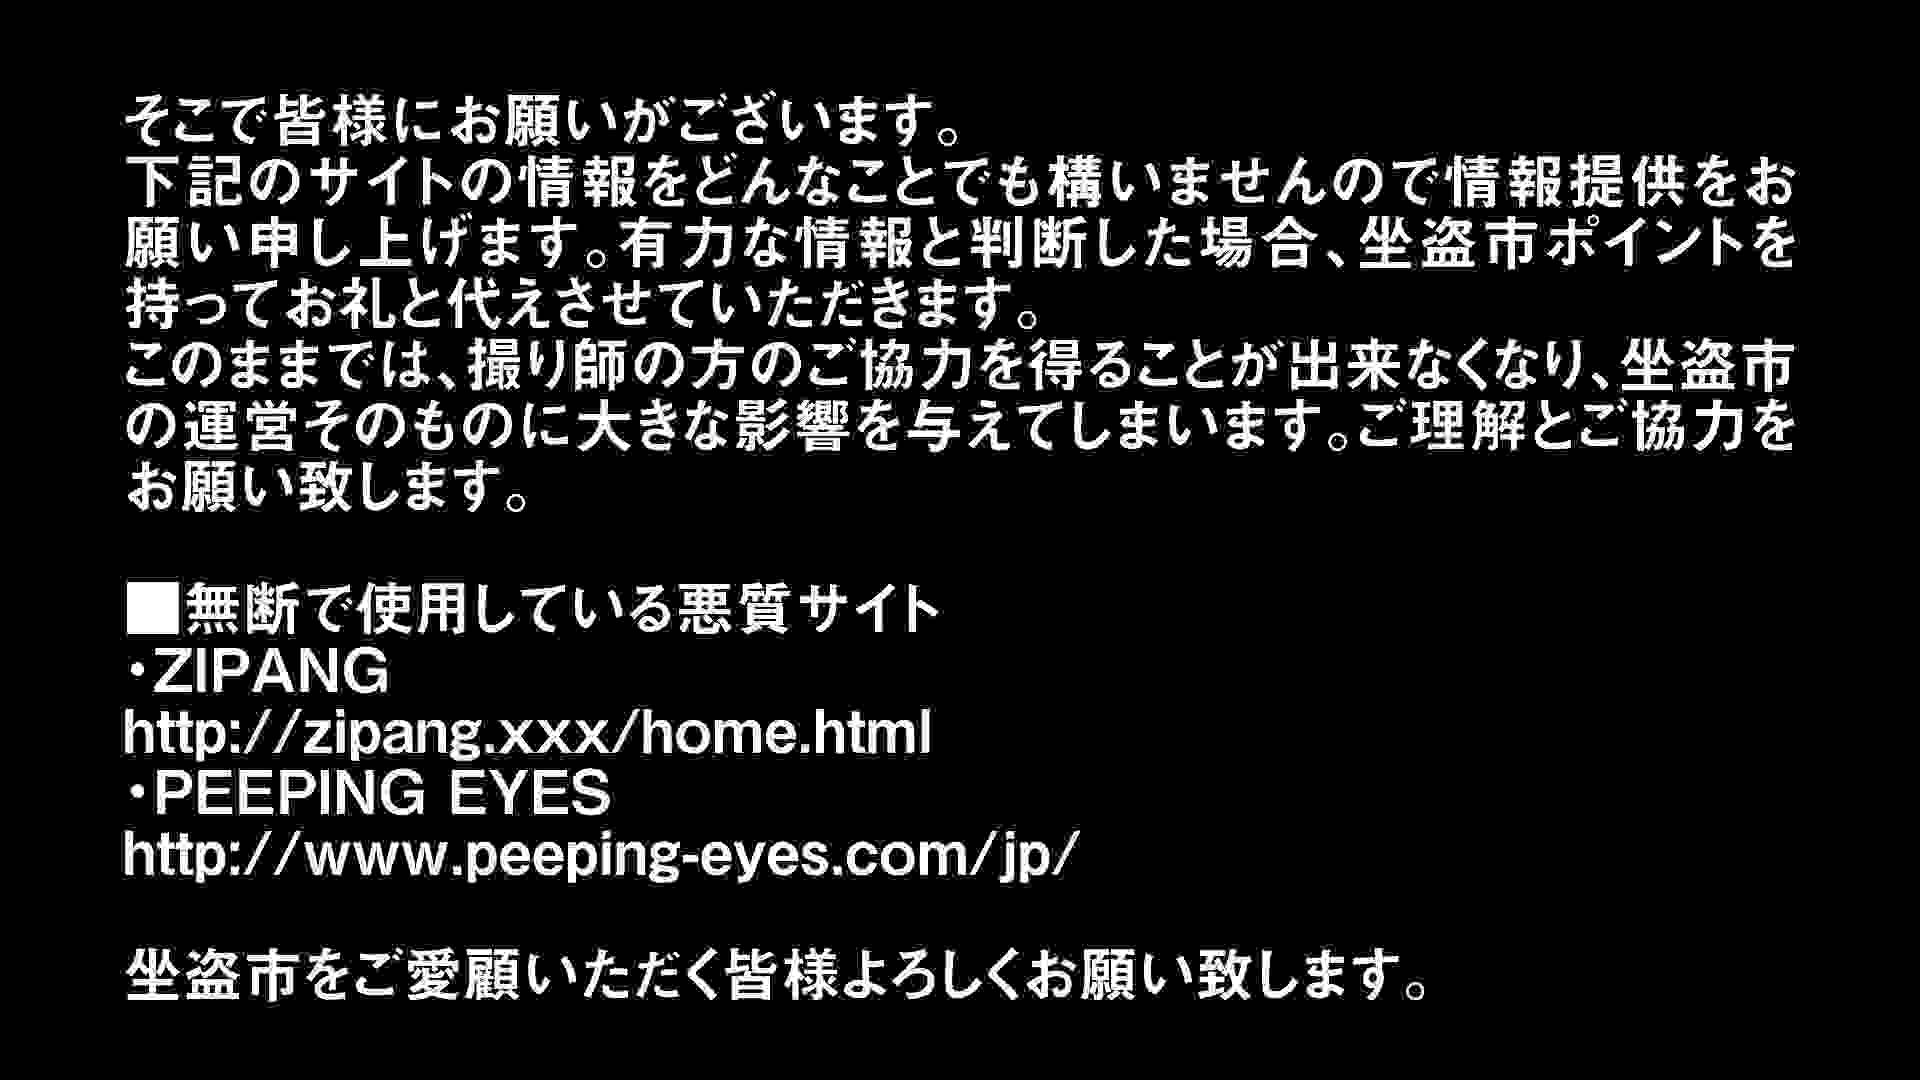 Aquaな露天風呂Vol.296 盗撮シリーズ   露天風呂編  102PIX 49